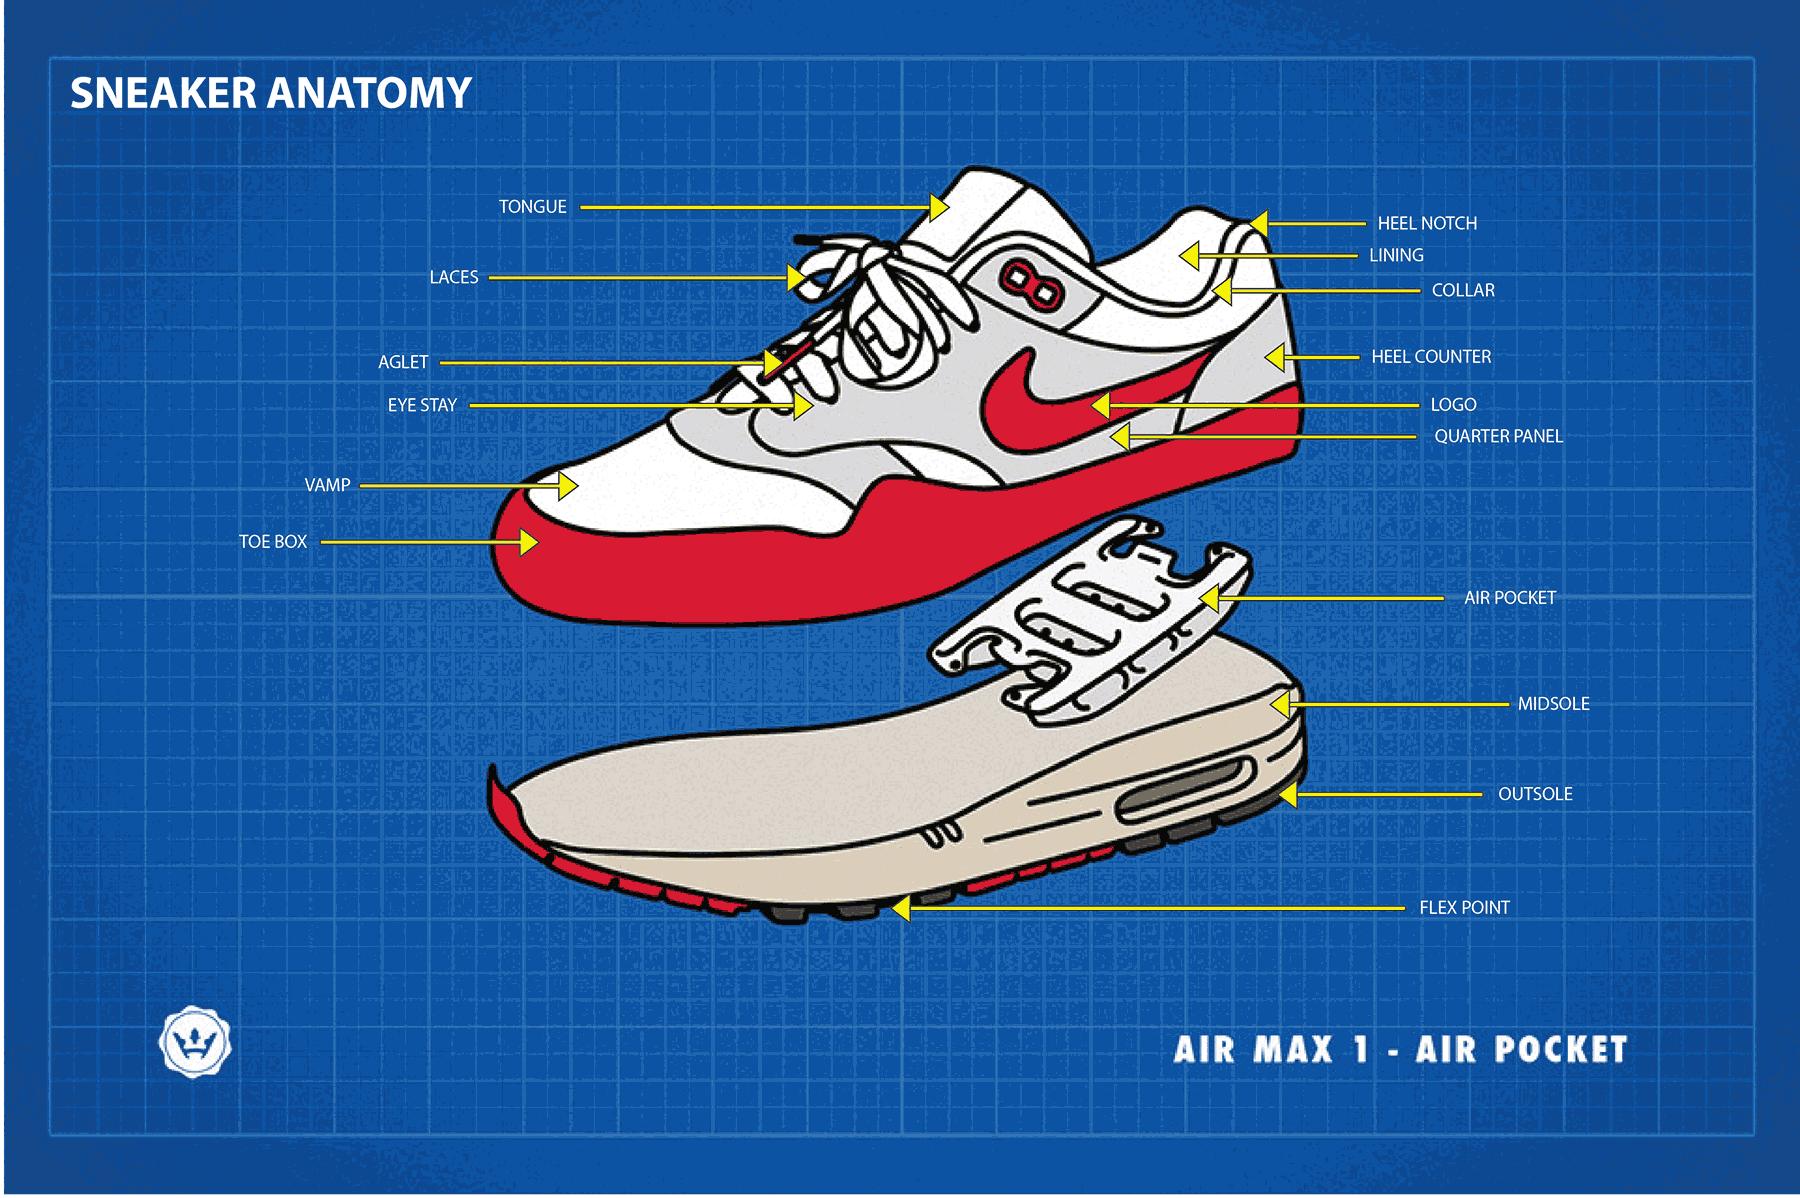 Sneaker Anatomy - FIT Sneaker Essentials